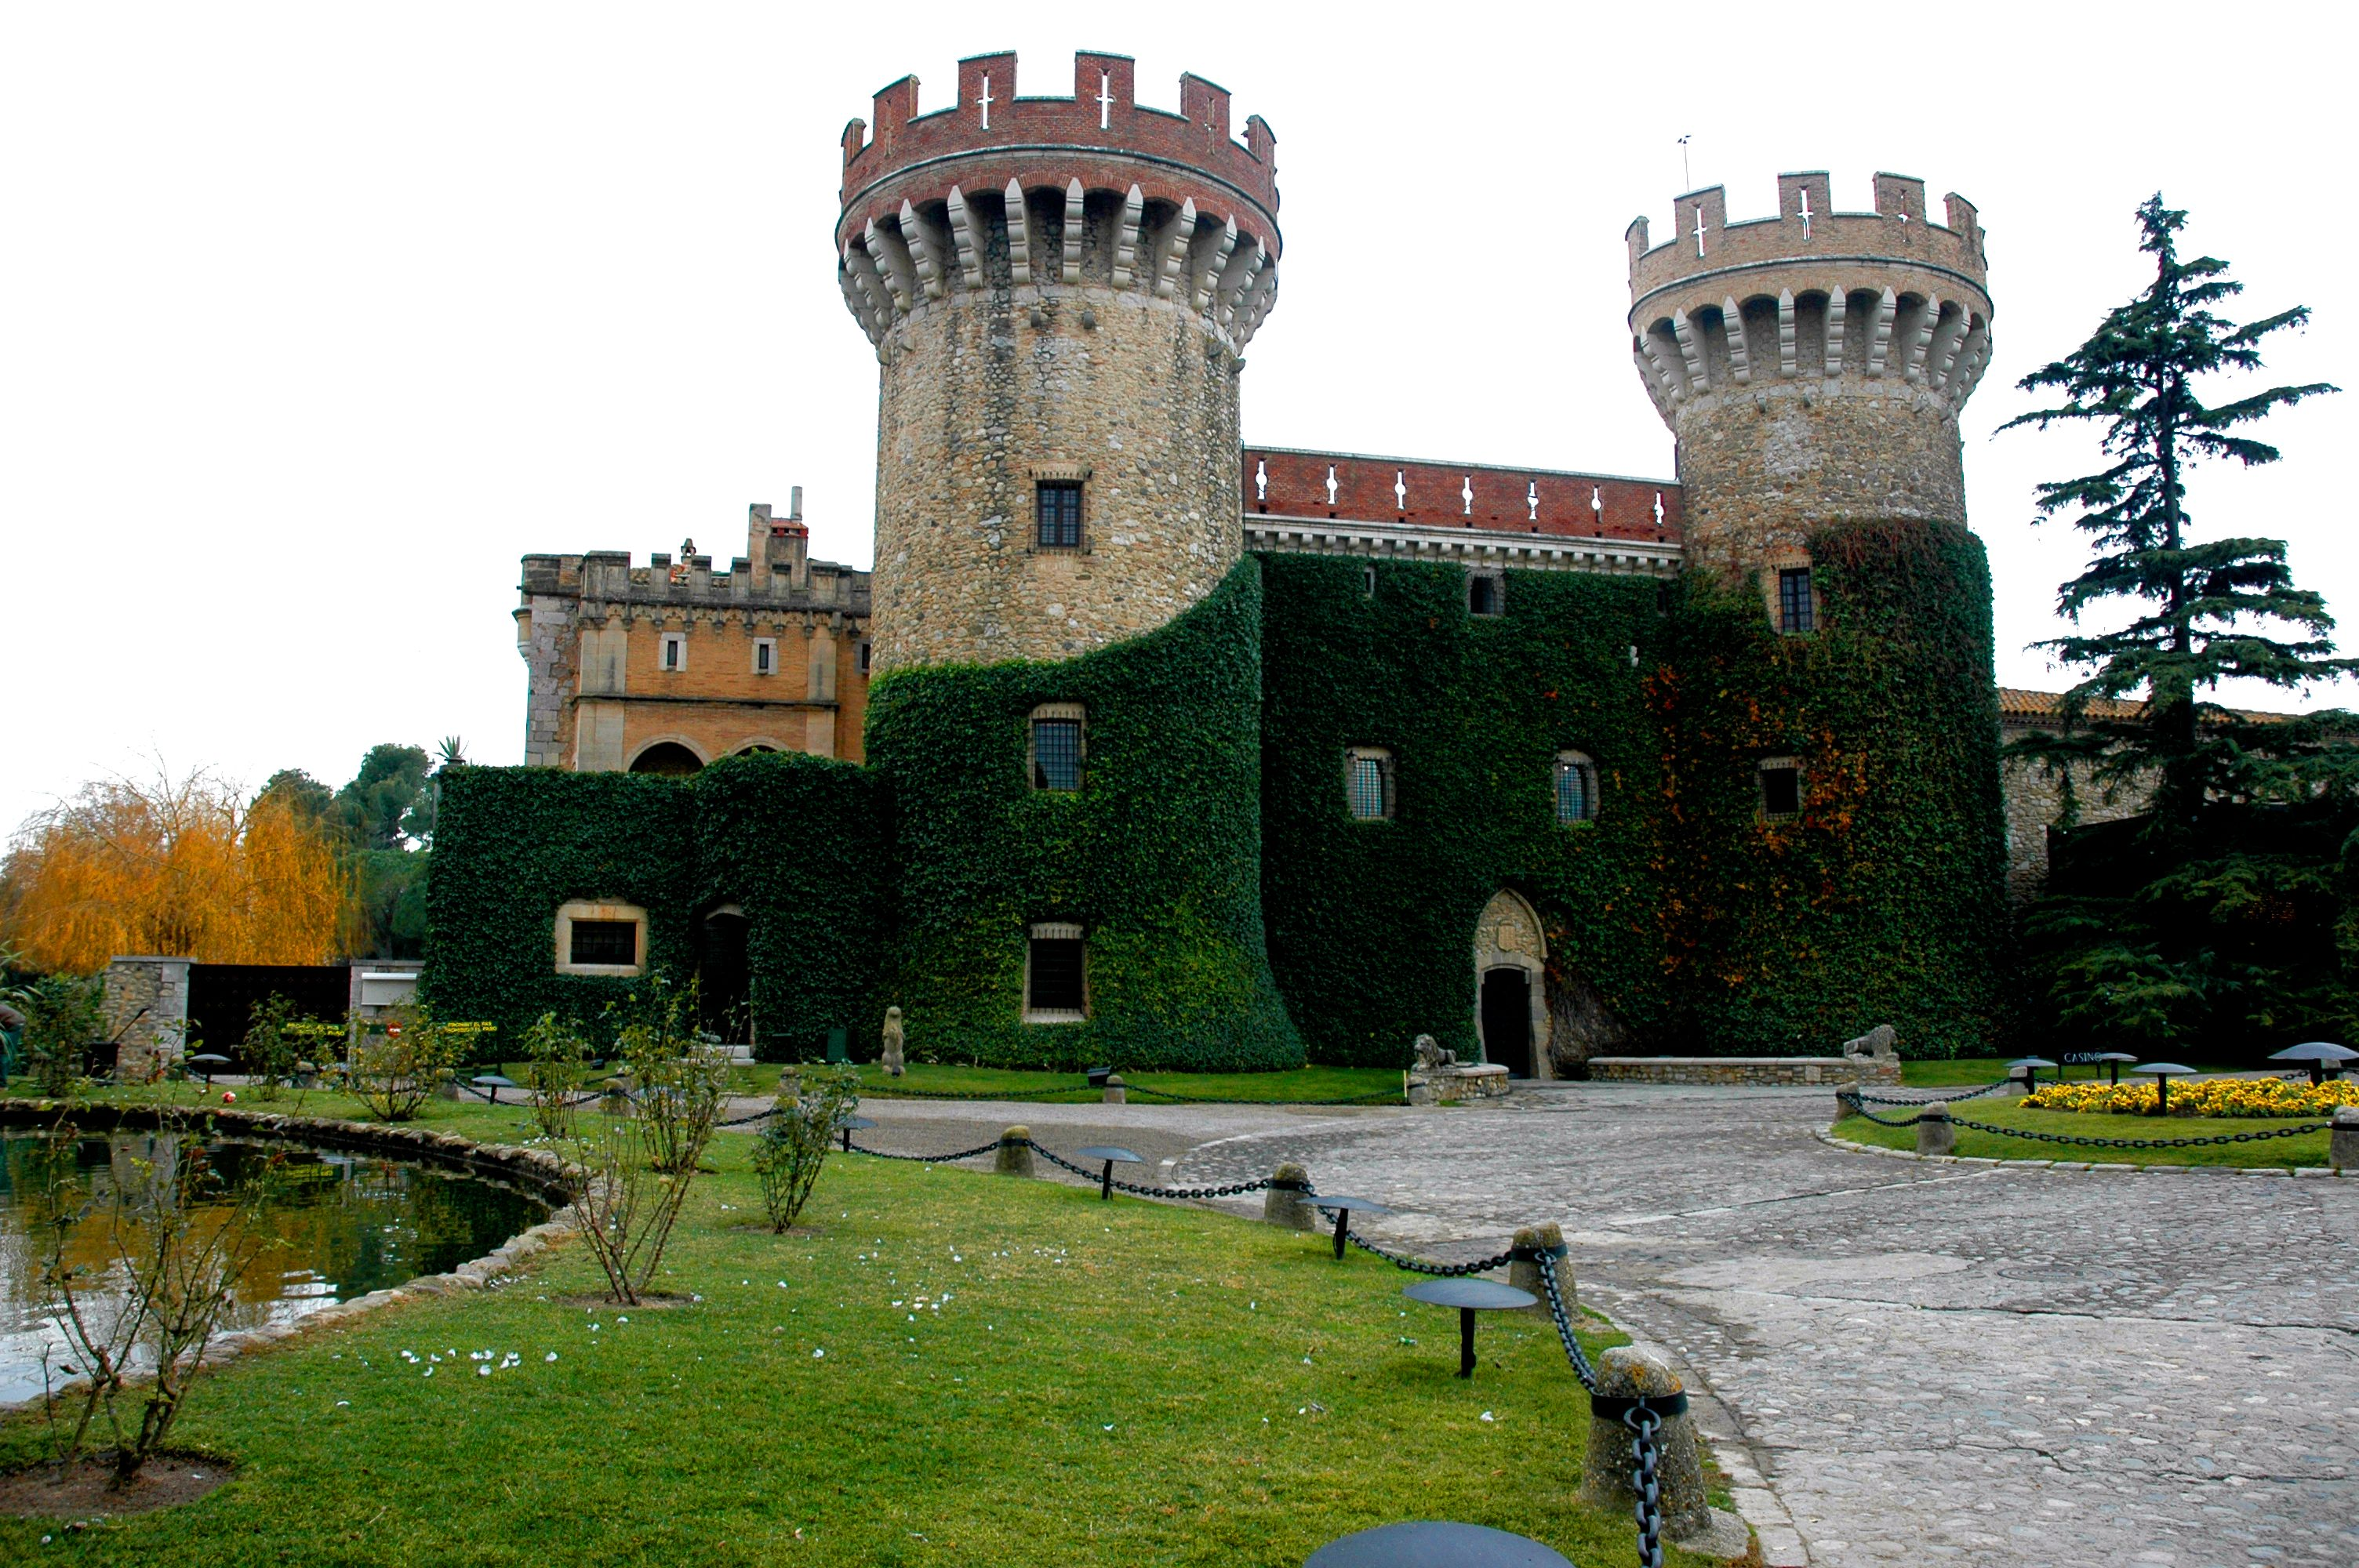 https://upload.wikimedia.org/wikipedia/commons/e/ee/Castell_de_Peralada.JPG